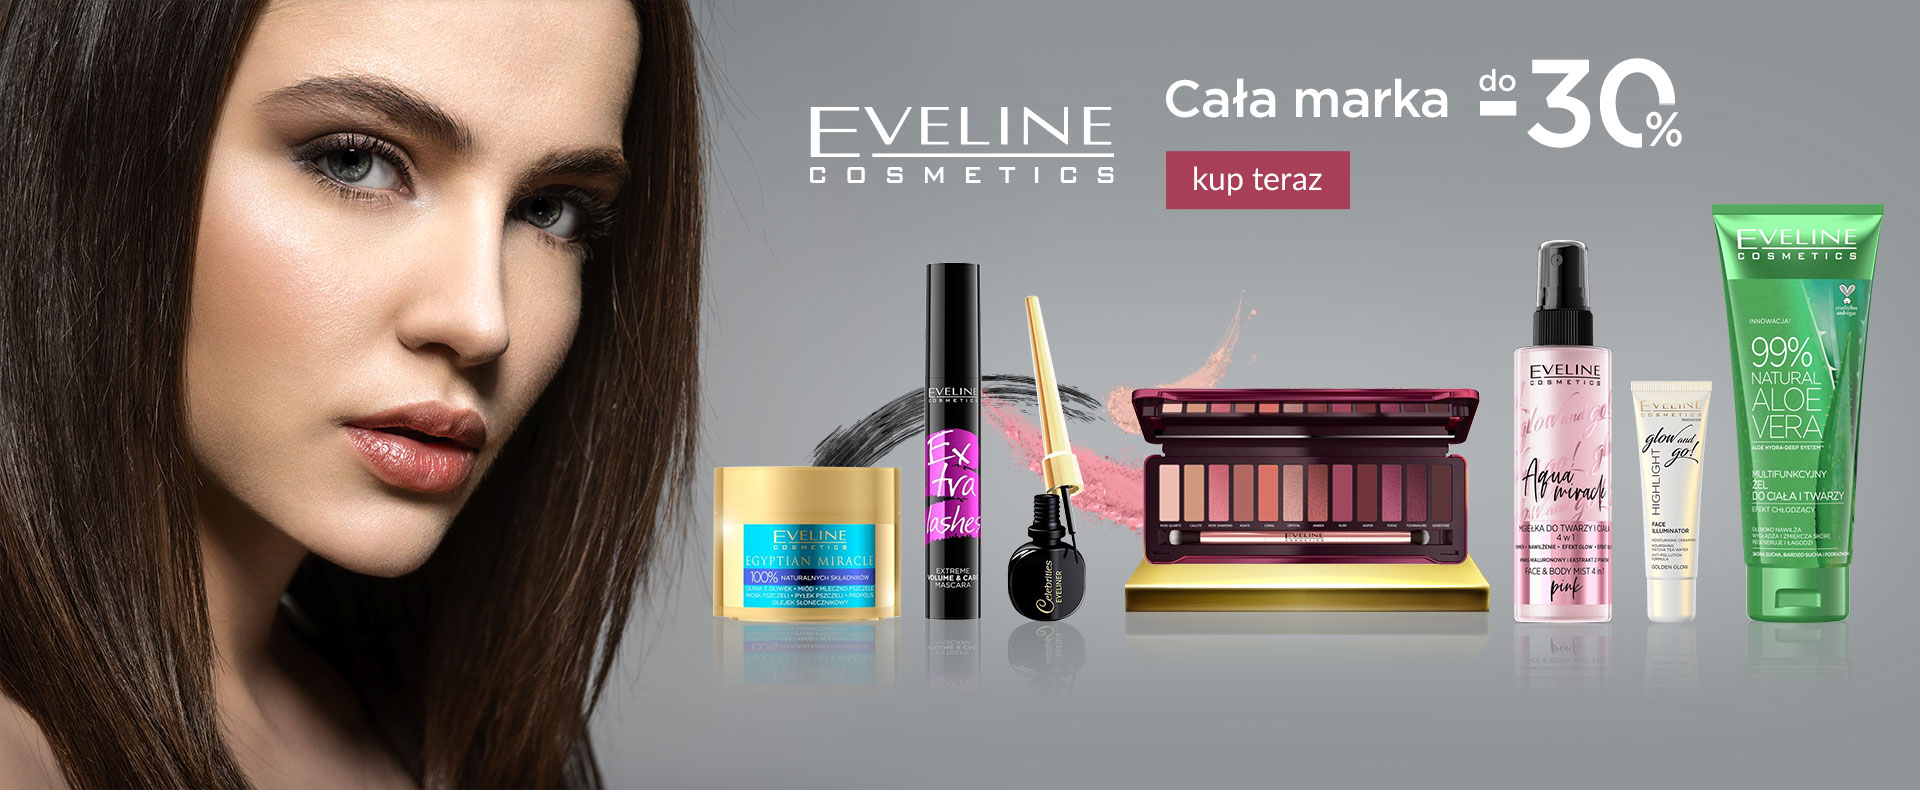 Ezebra Ezebra: do 30% rabatu na kosmetyki marki Eveline Cosmetics